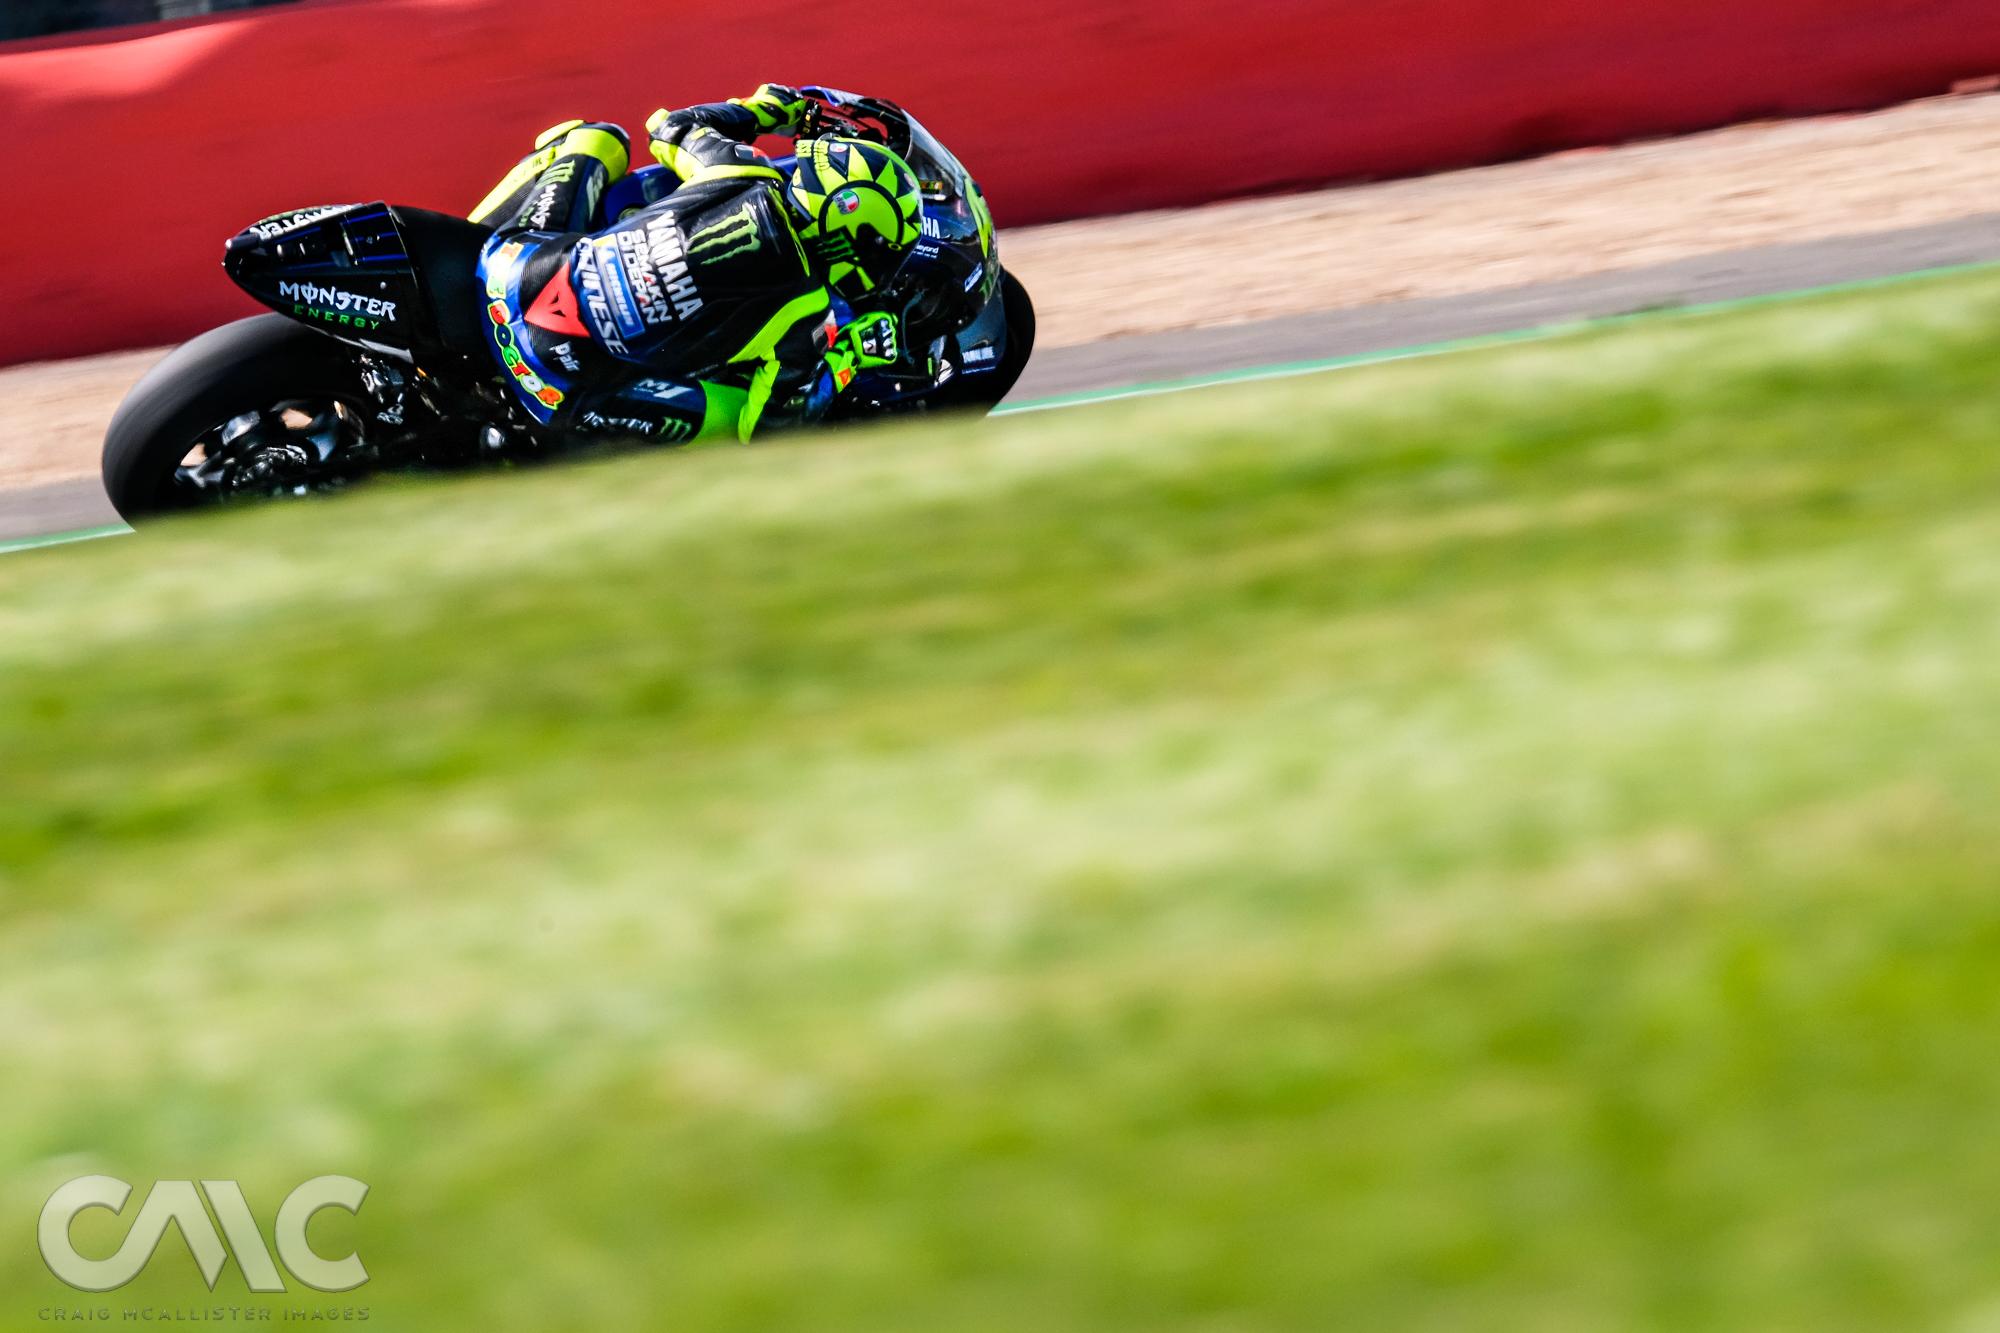 CMC_MotoGP_FP2_Silverstone 100-4001508.jpg